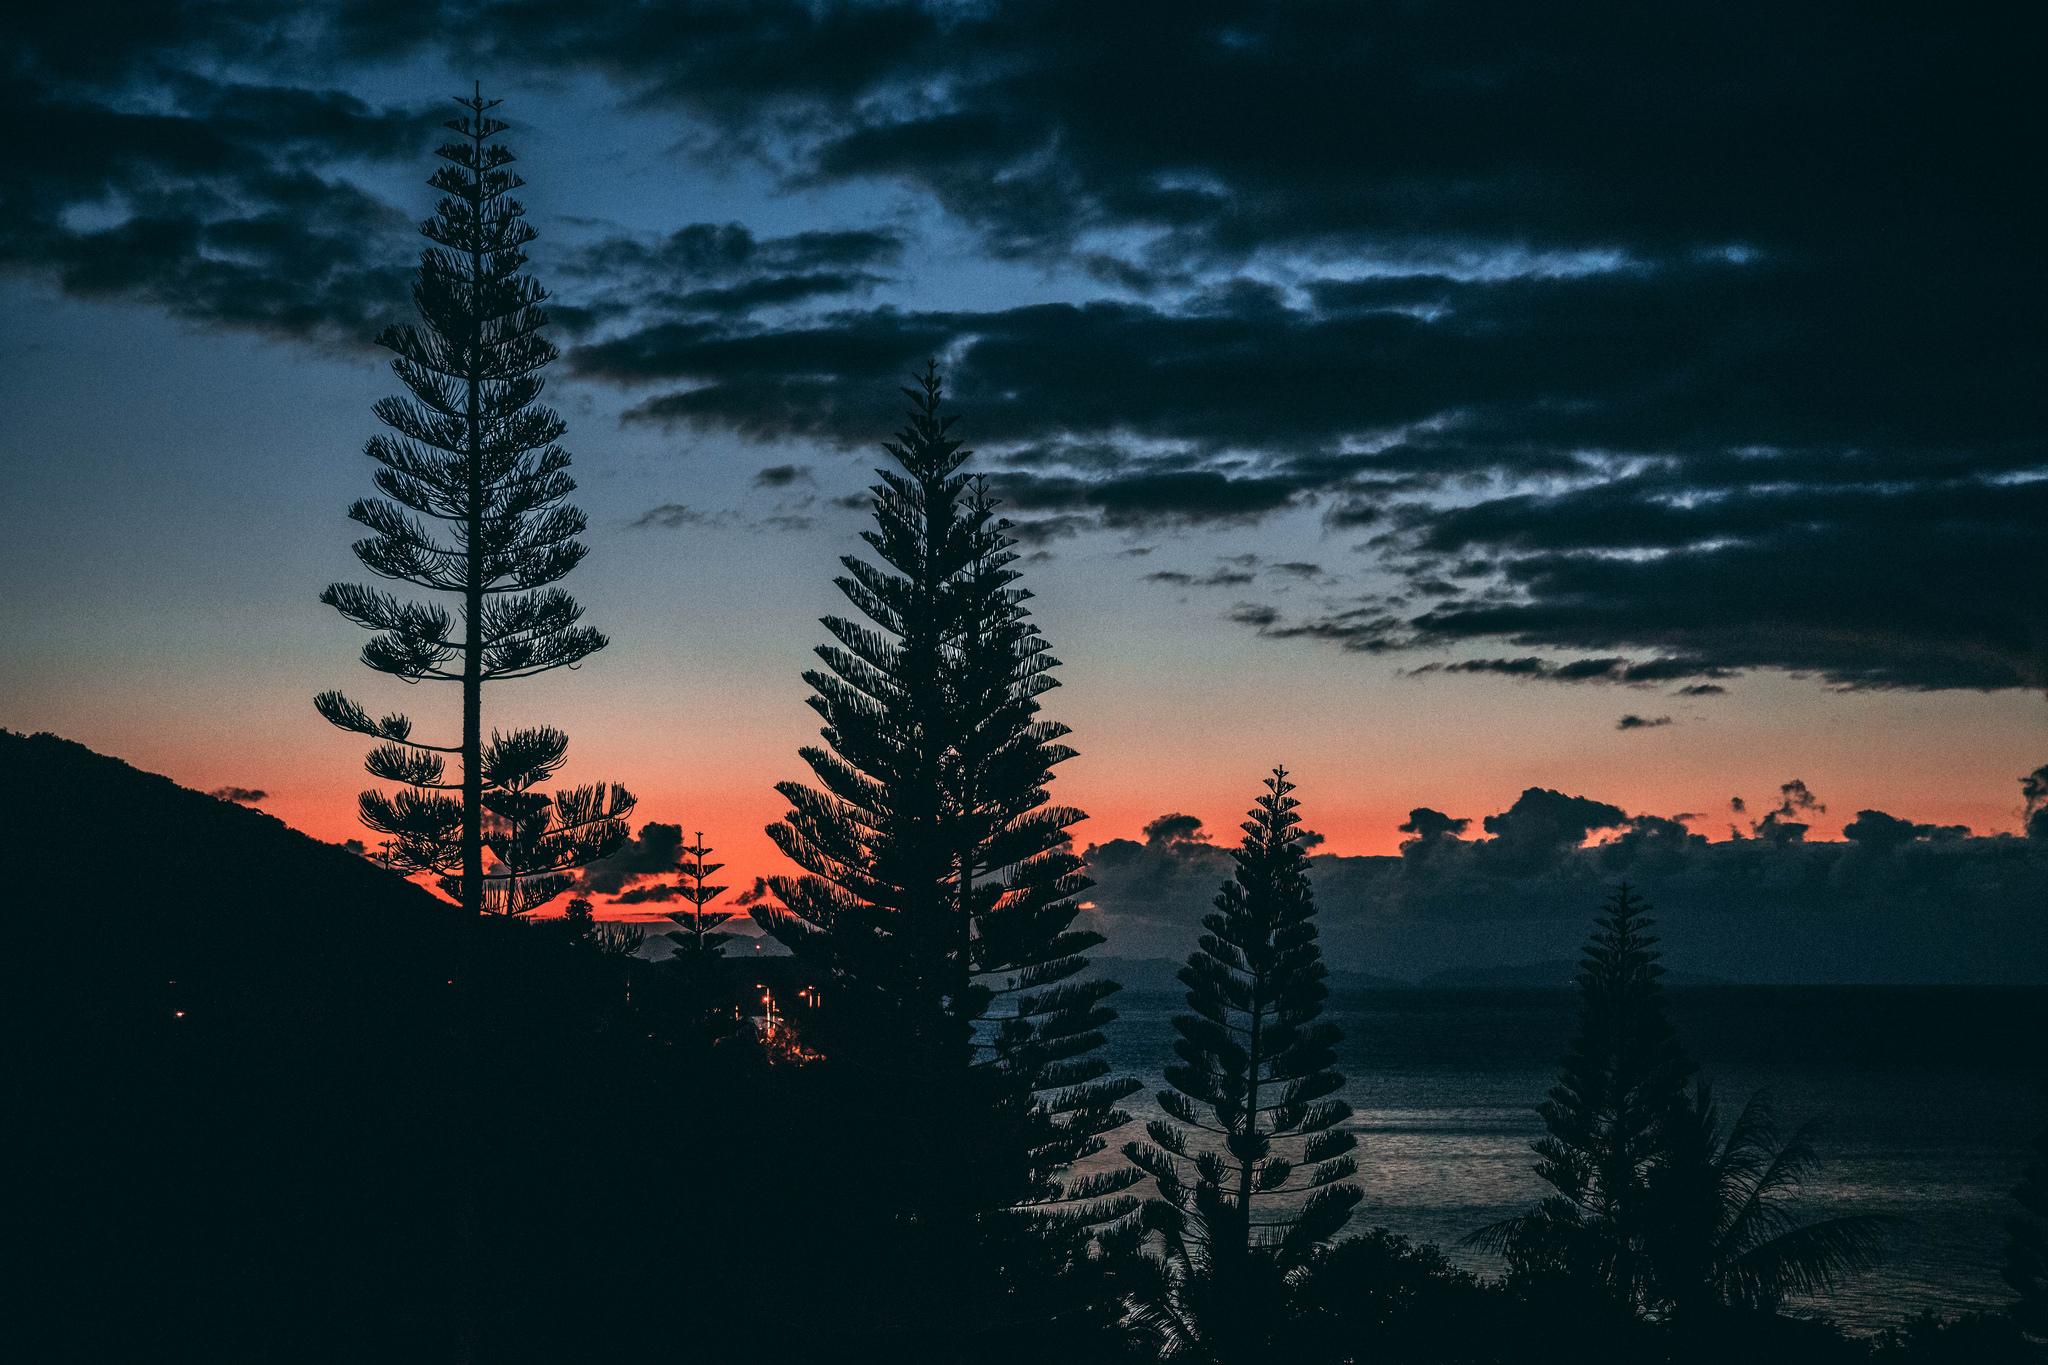 Image 3, Noumea Sunrise